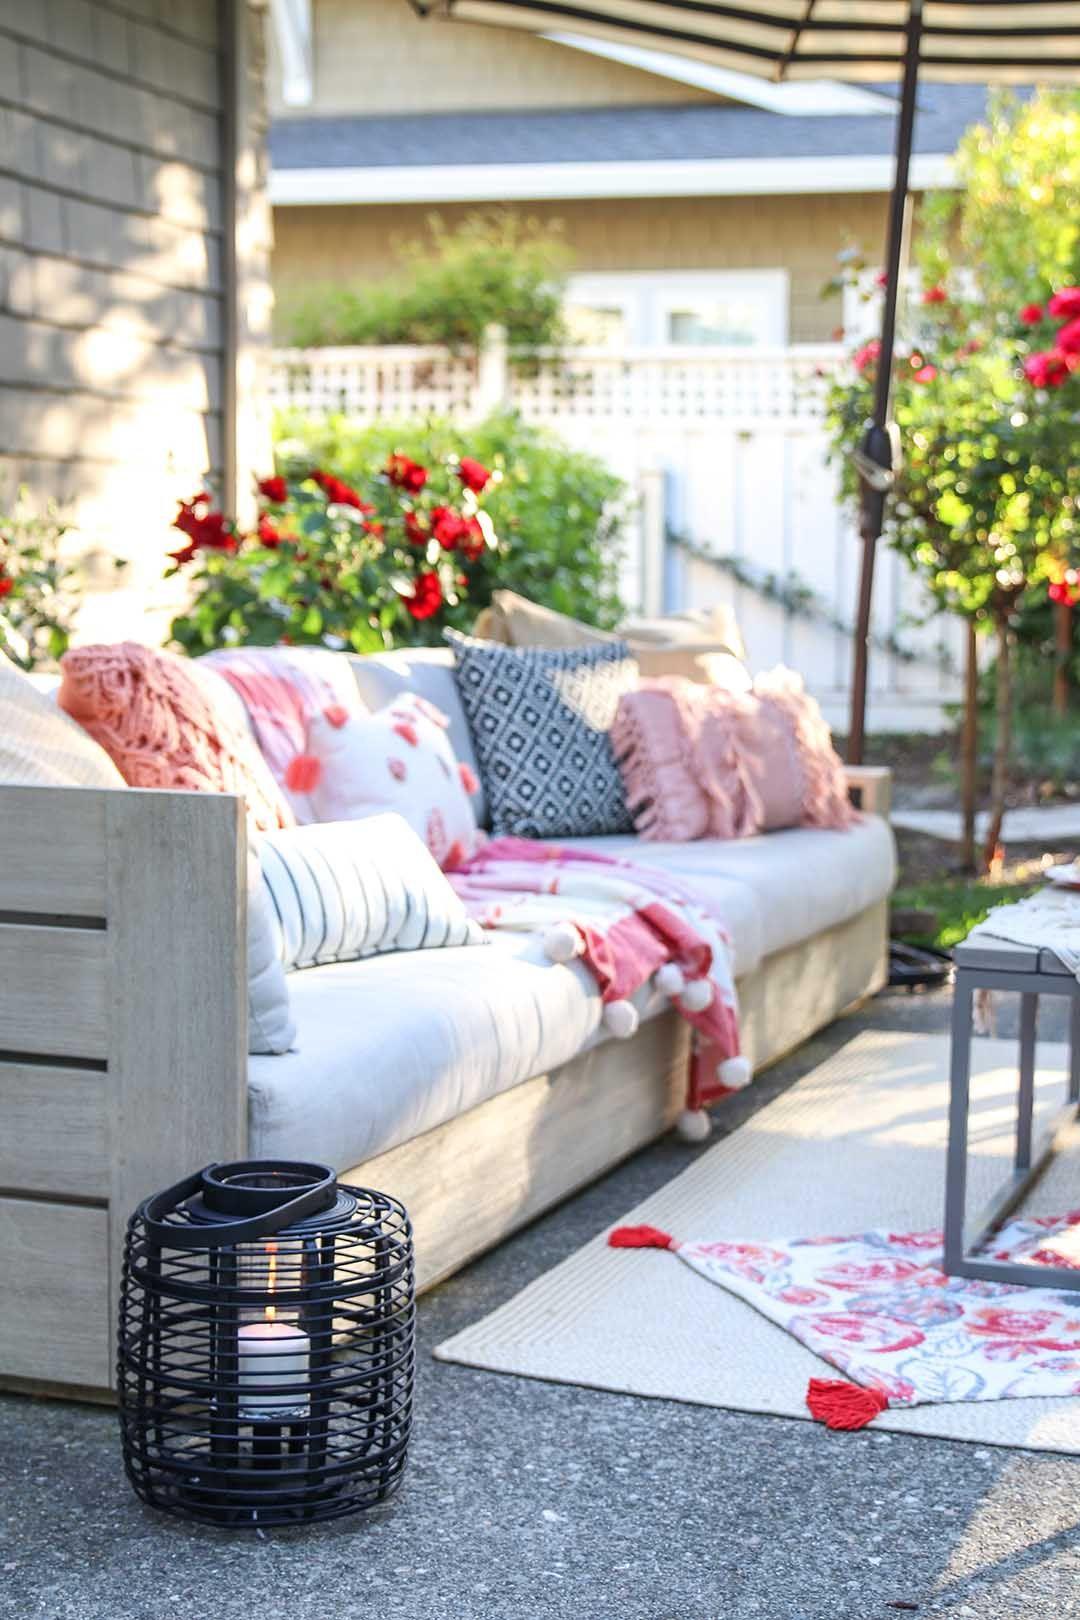 Patio Decorating Ideas 7 Simple Summer Updates Outdoor Spaces